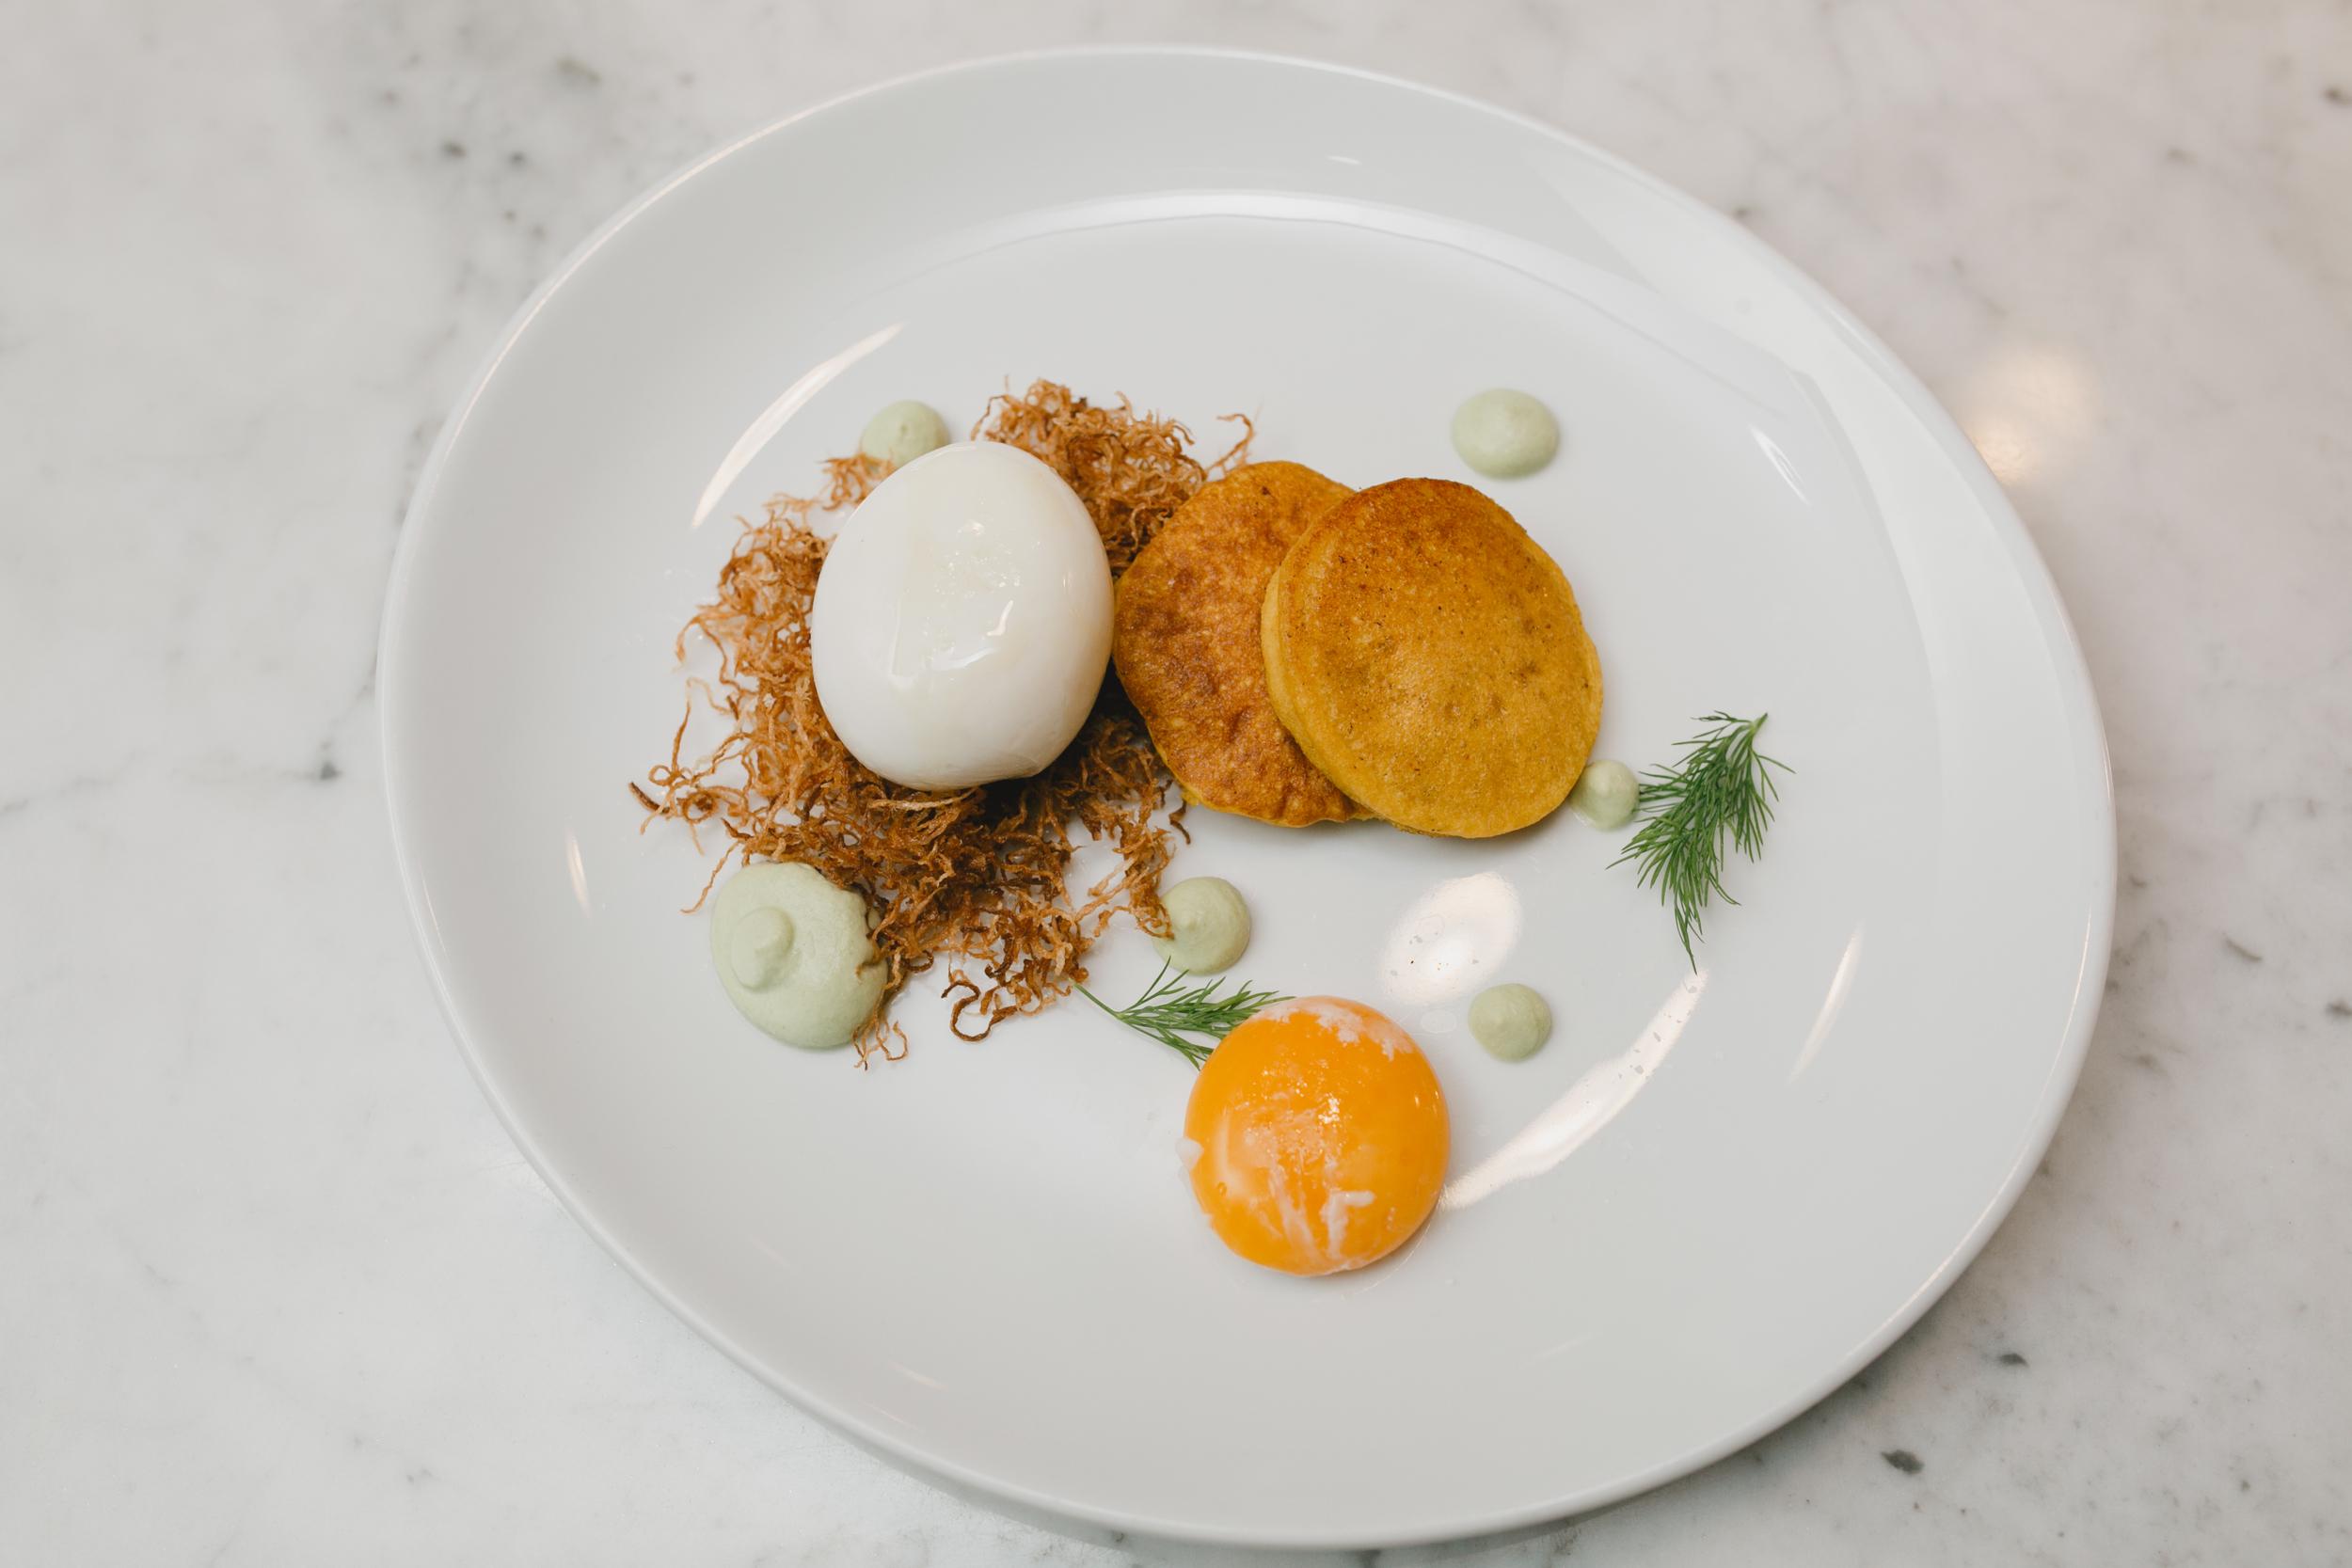 Jidori Egg Caviar //Daikon Bed, Culantro Crema, Turmeric Blini (Might have been my favorite course of the evening.)